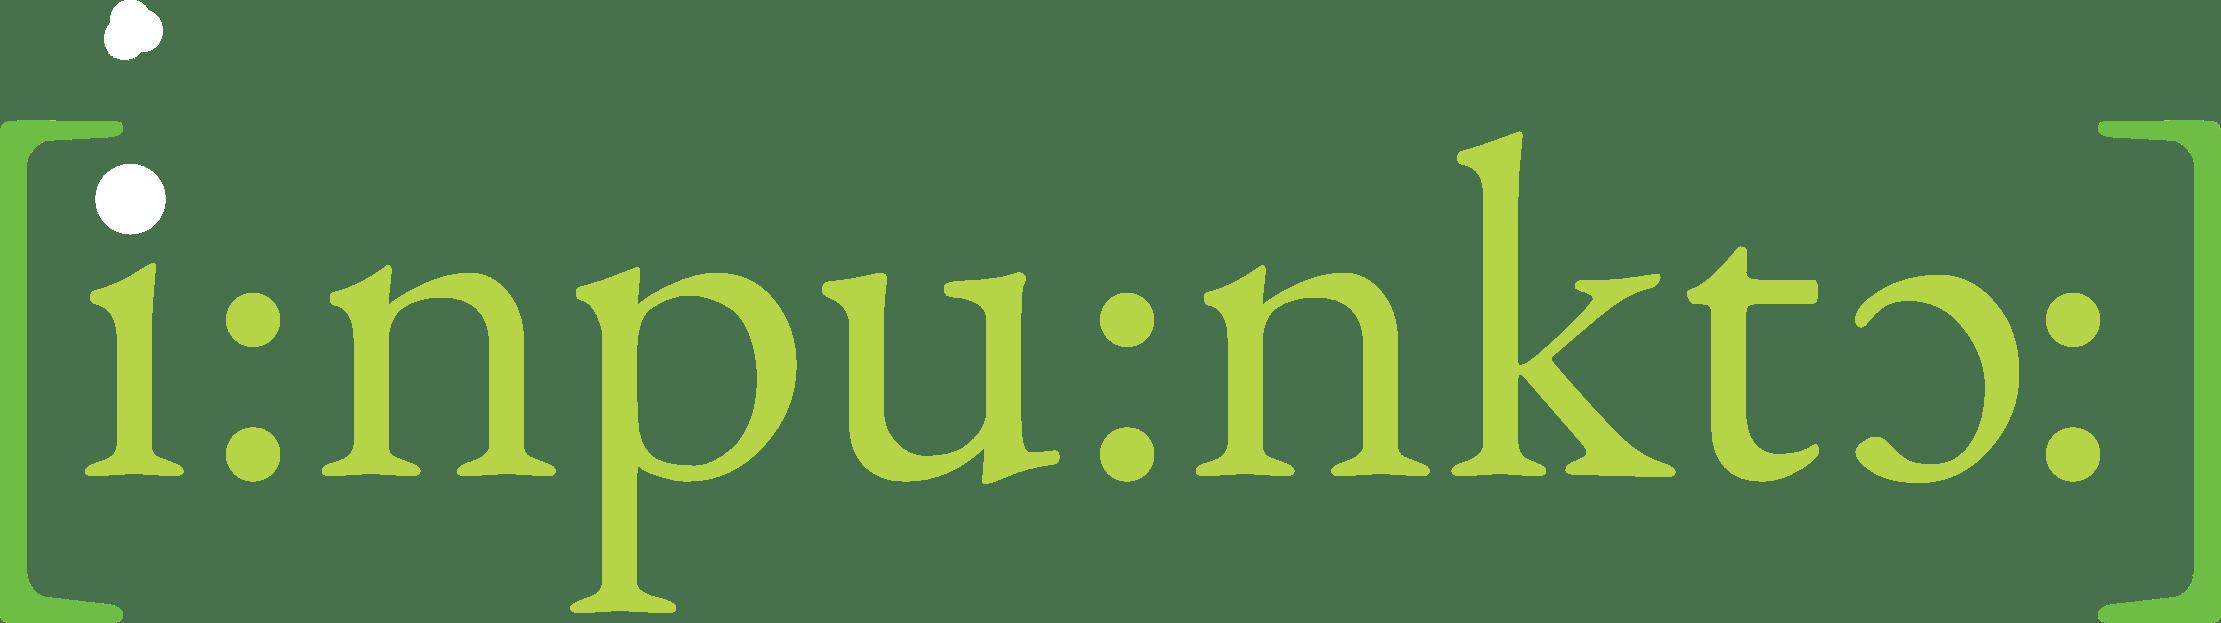 inpunkto Logo